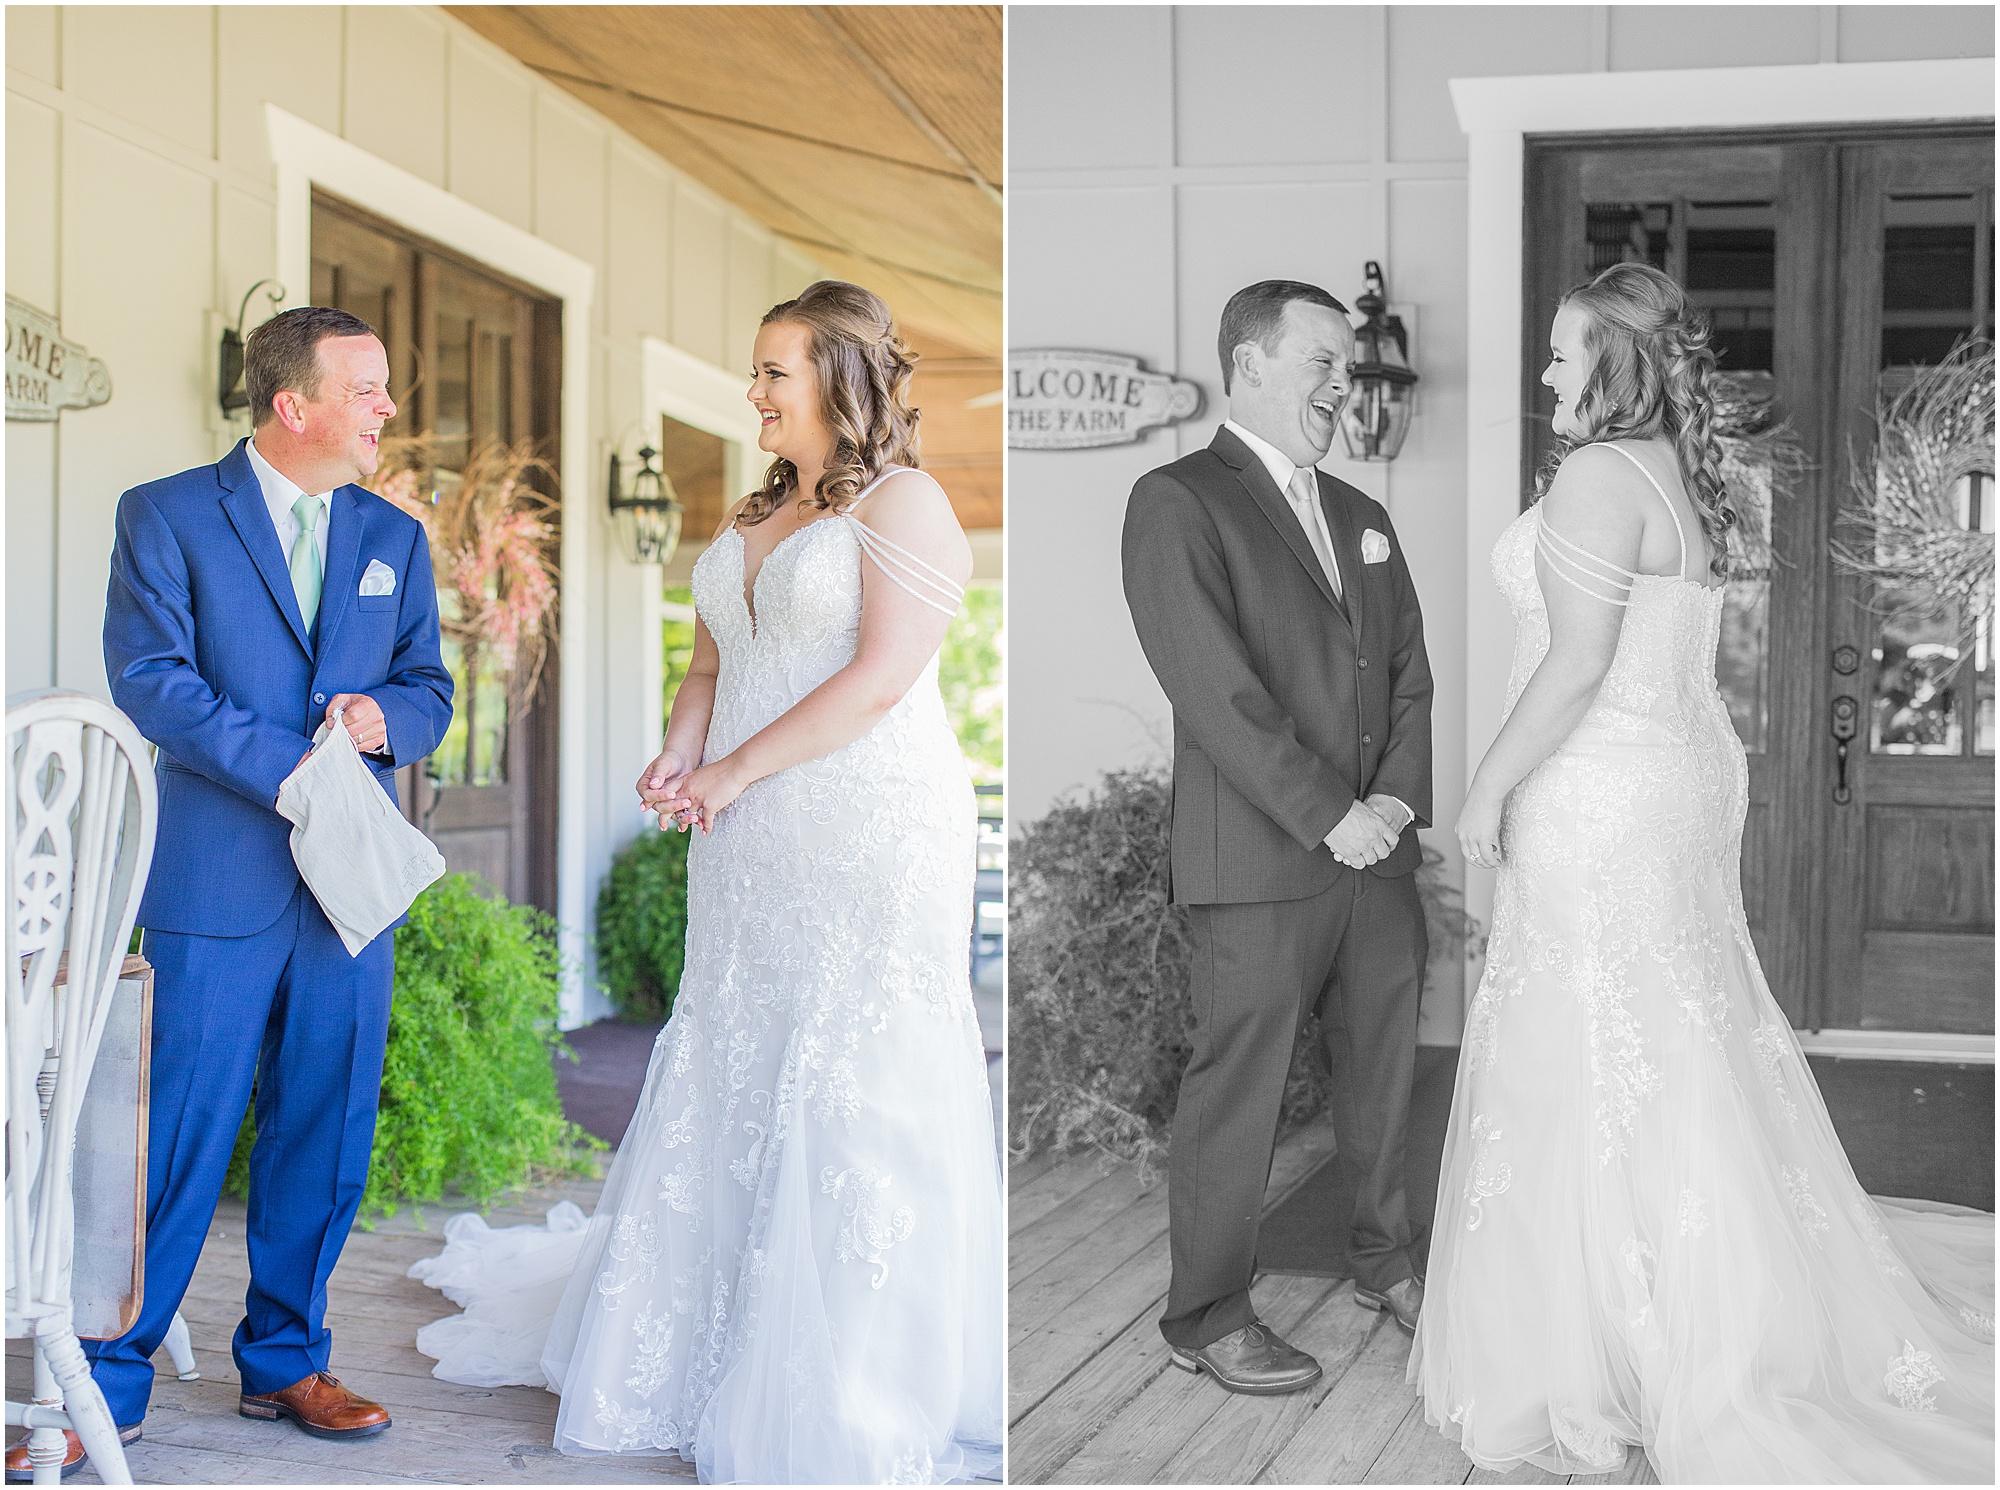 starkville-mississippi-wedding-page-place-dodson-farms_0019.jpg